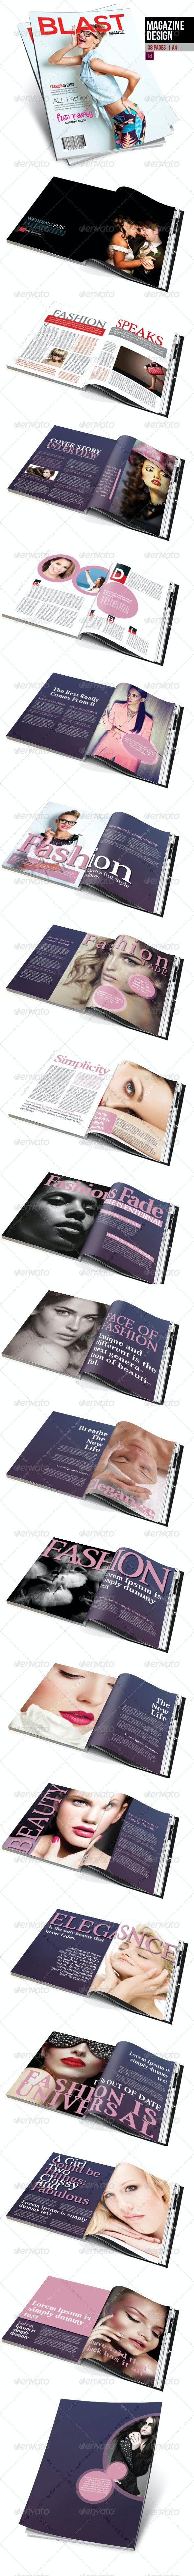 Magazine Design - Magazines Print Templates